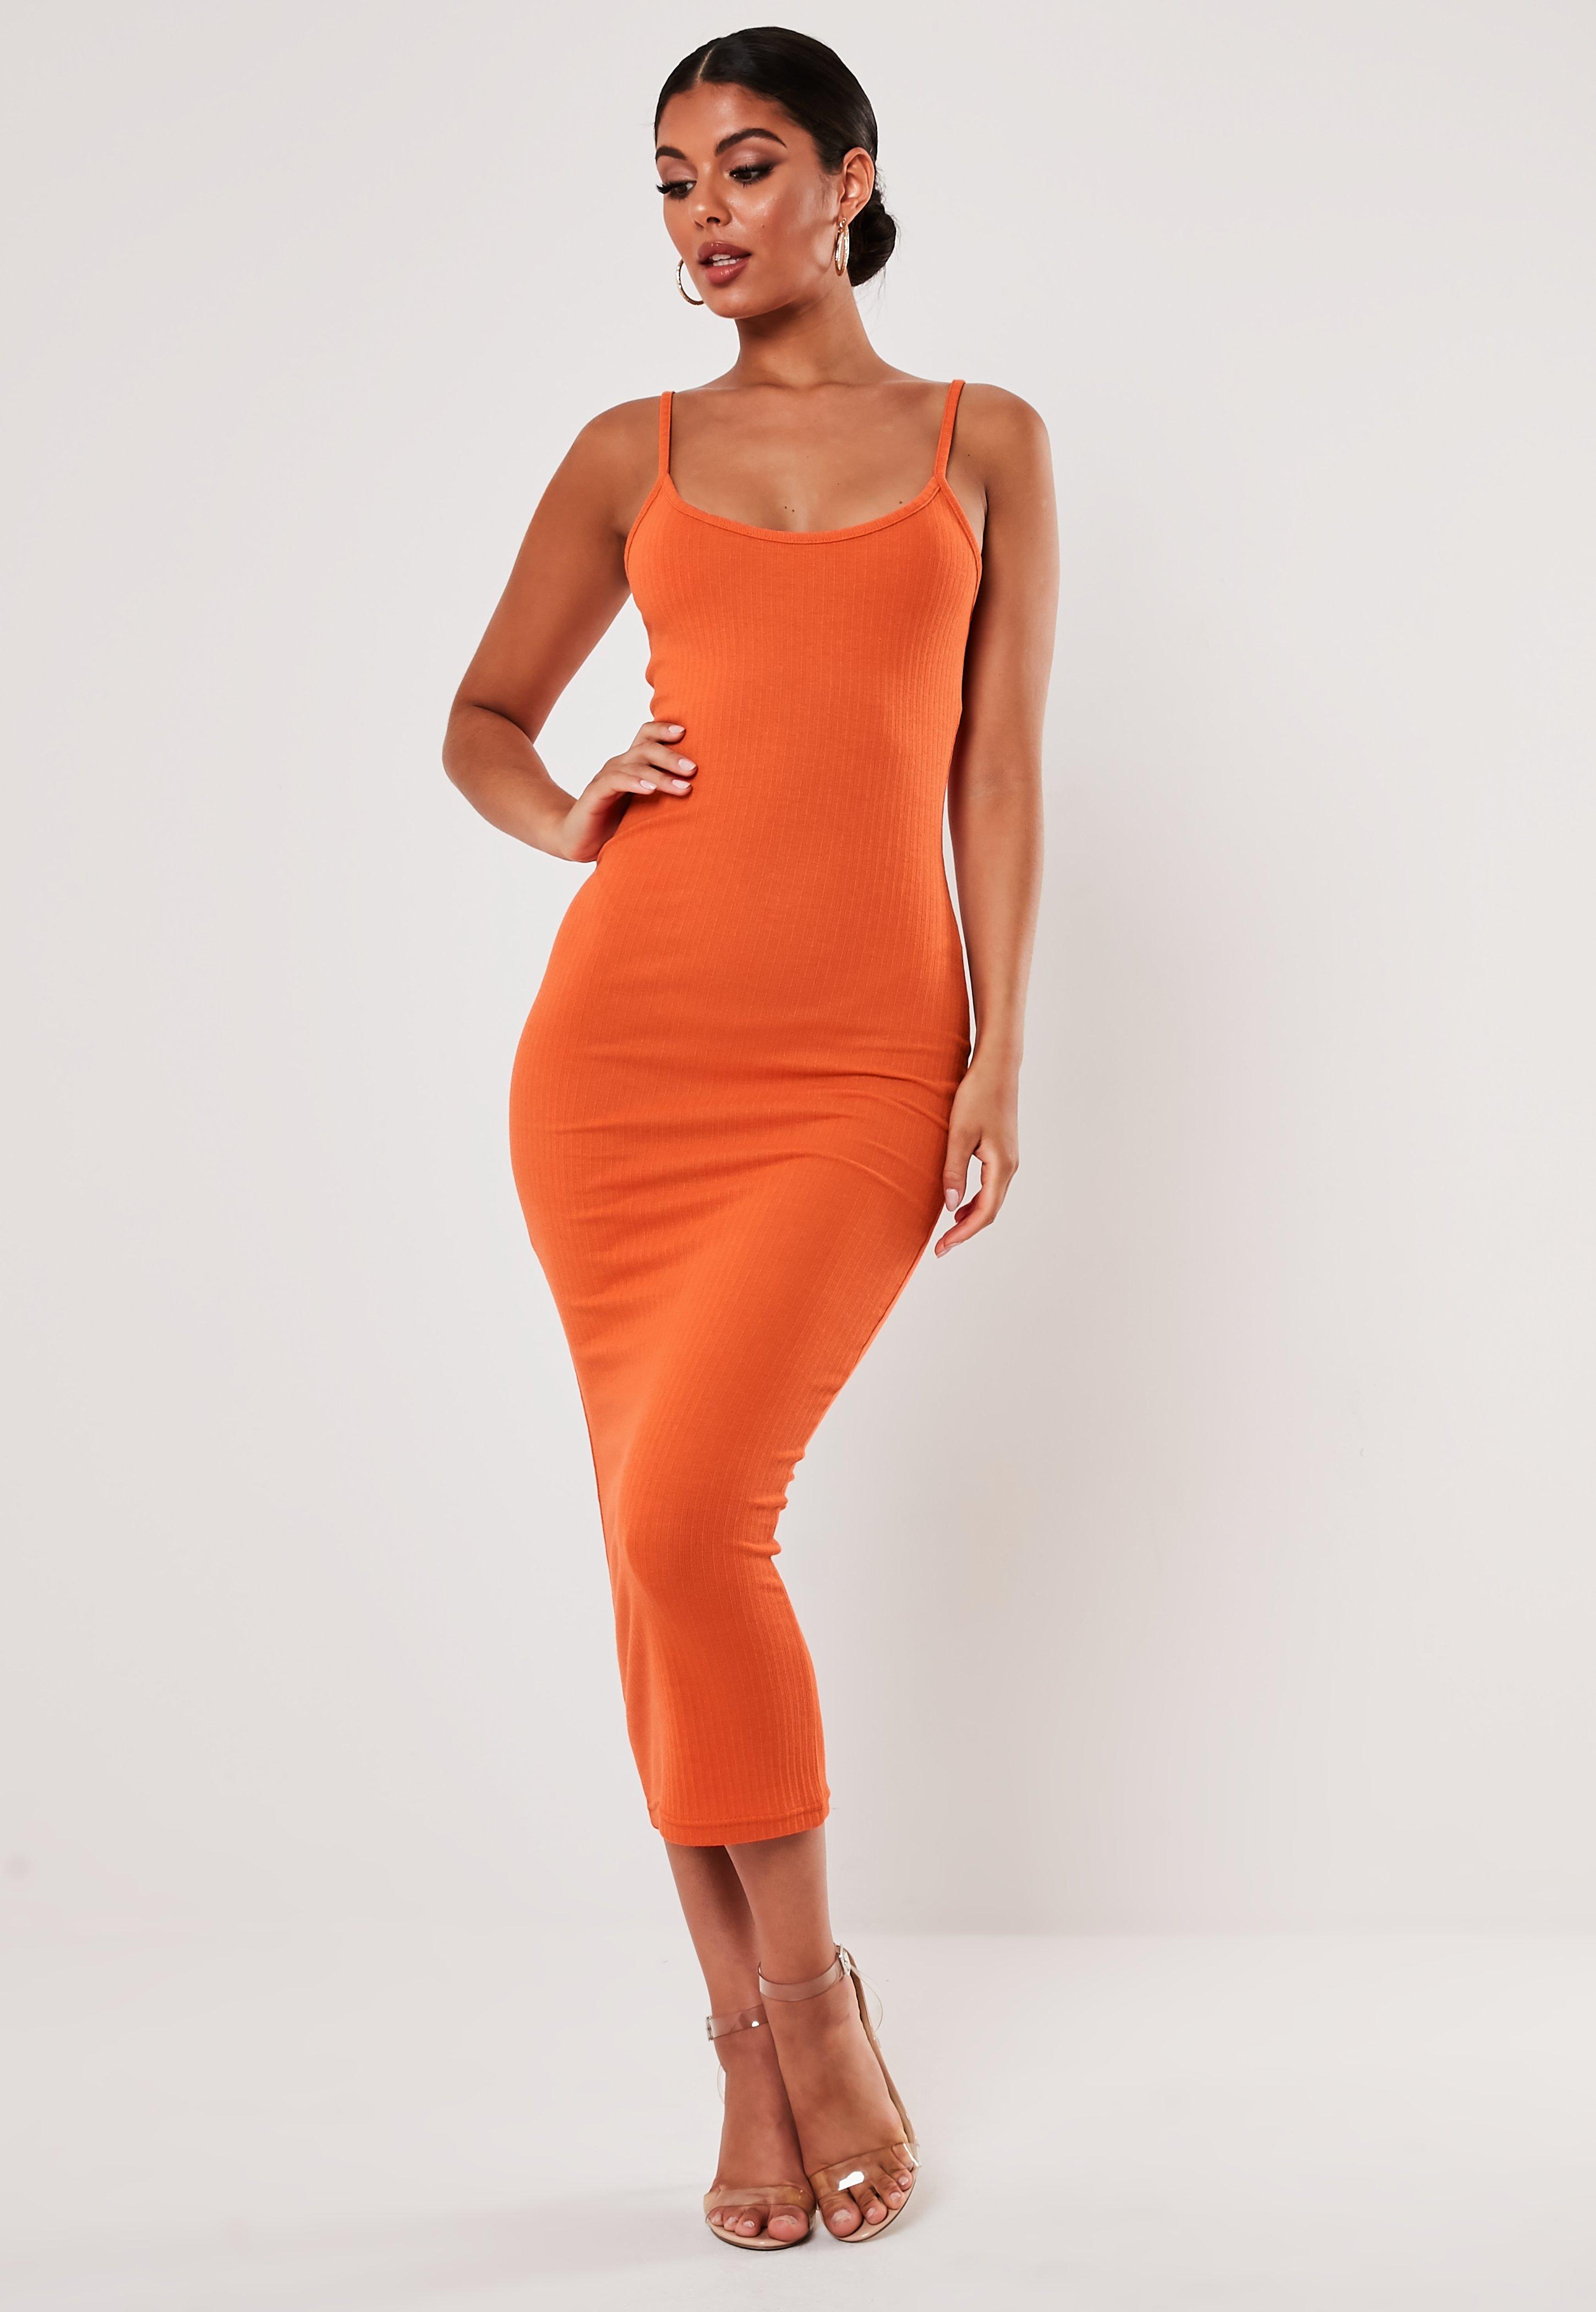 5a1f65fbe5ed8 Orange Rib Strappy Midi Dress